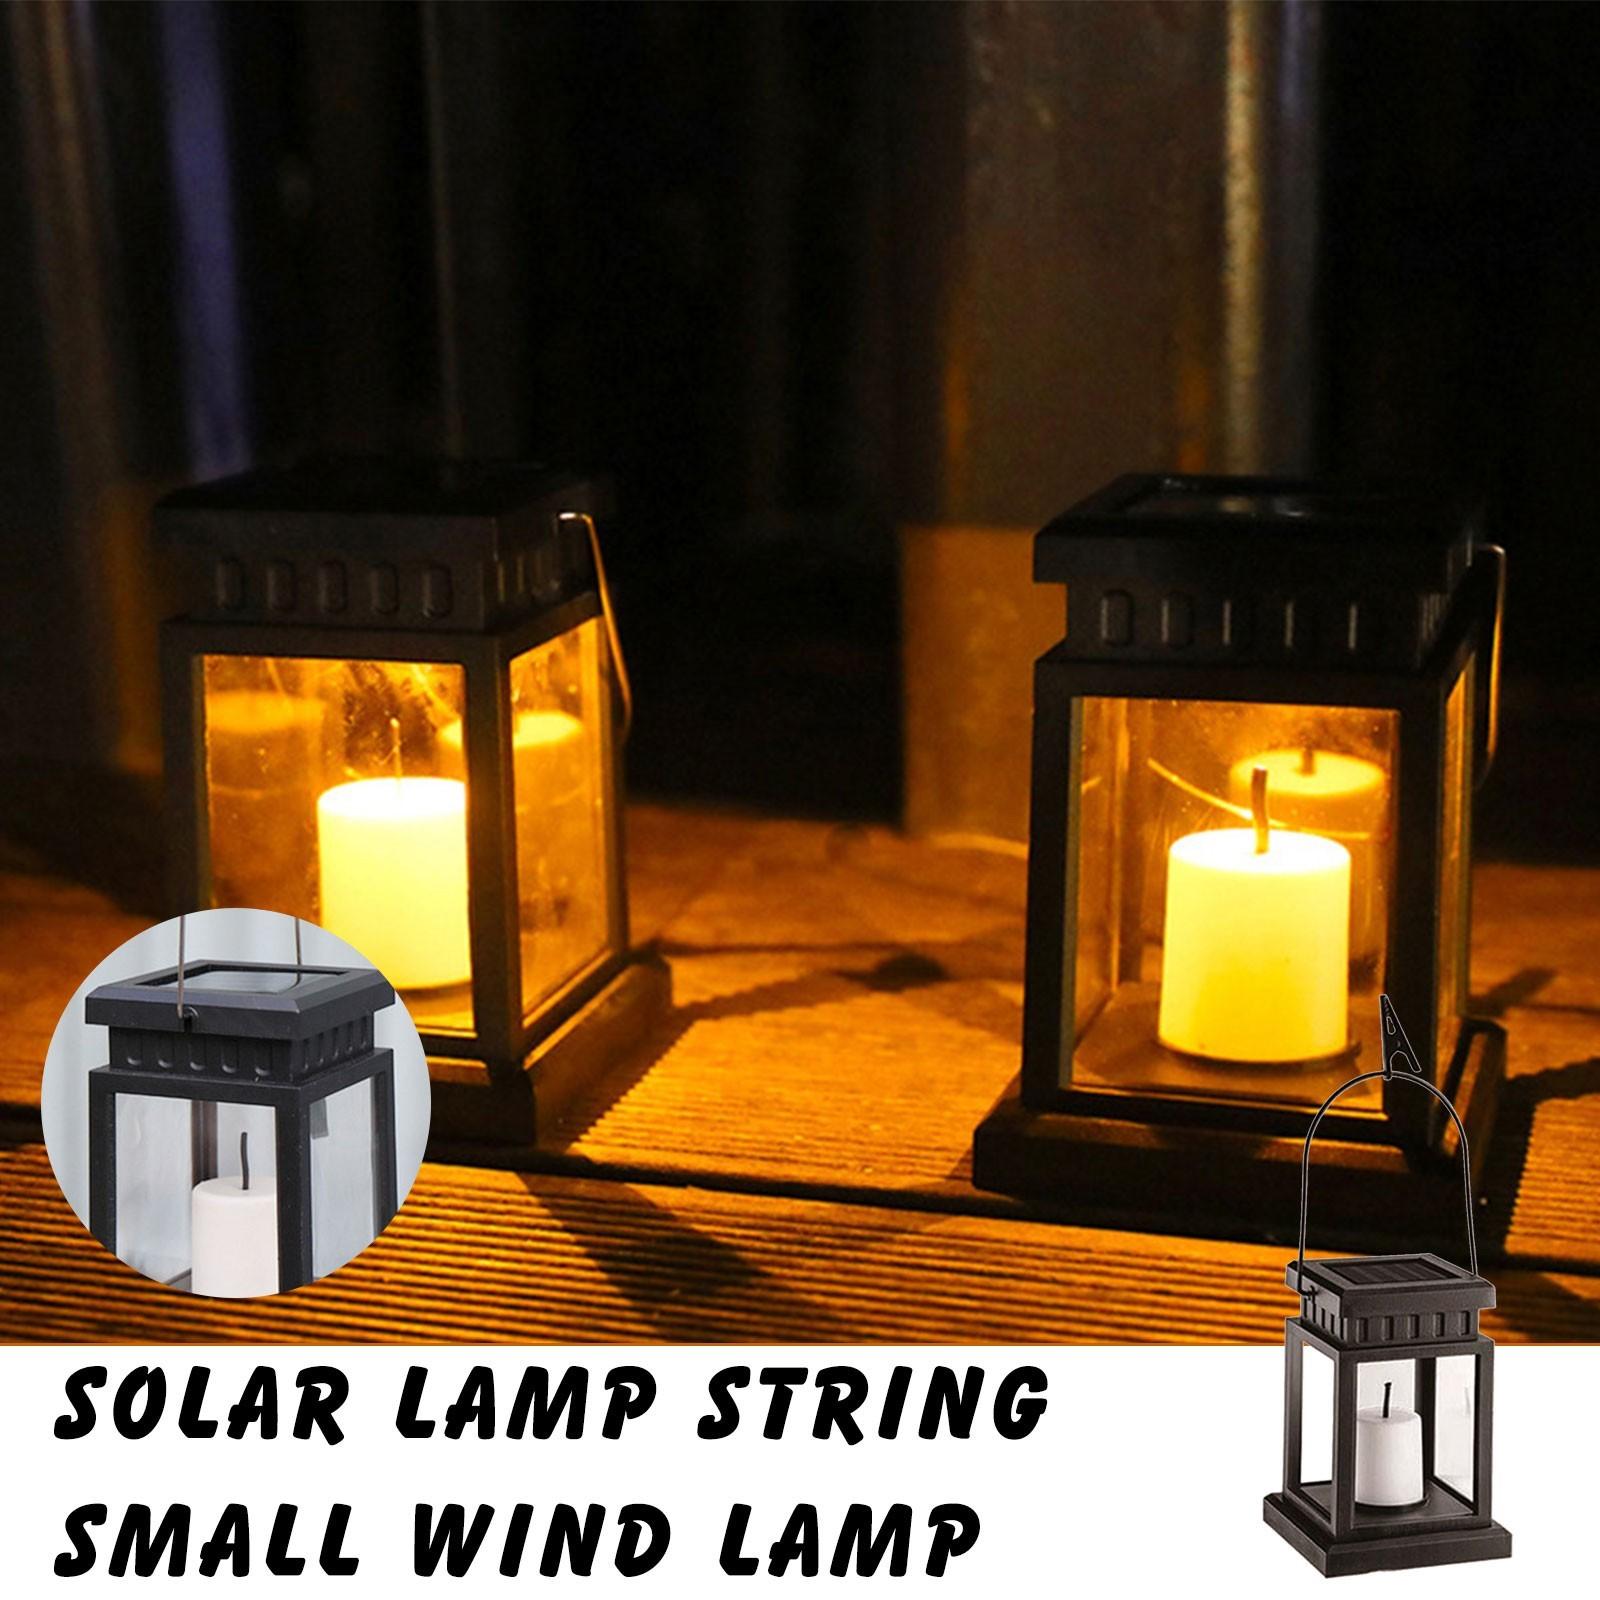 Antique Solar Portable Lantern Garden Decor Landscape Light With Iron Clip Holiday Party Courtyard Balcony Atmosphere Light#W